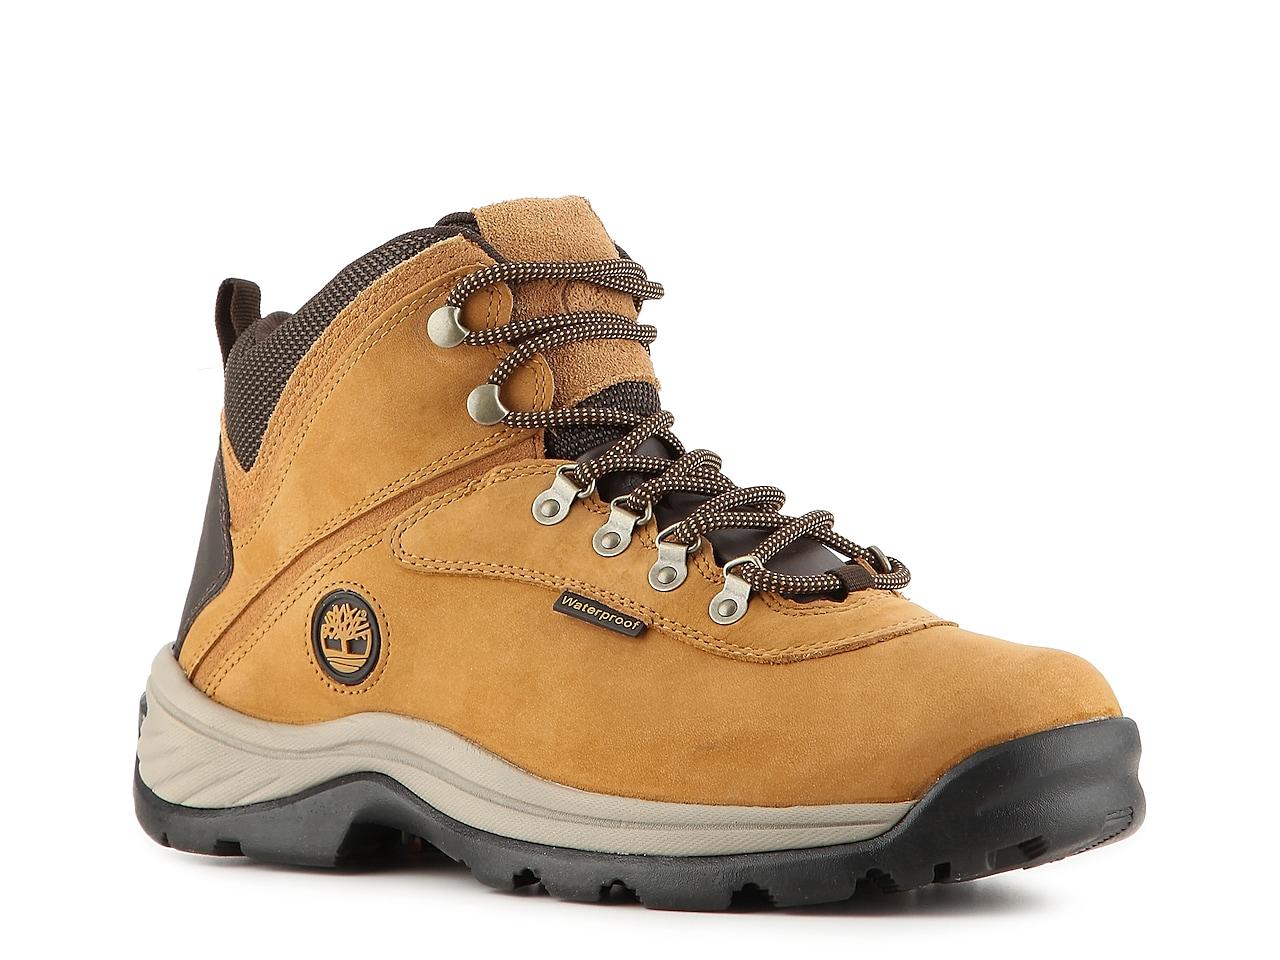 White Ledge Hiking Boot - Men's